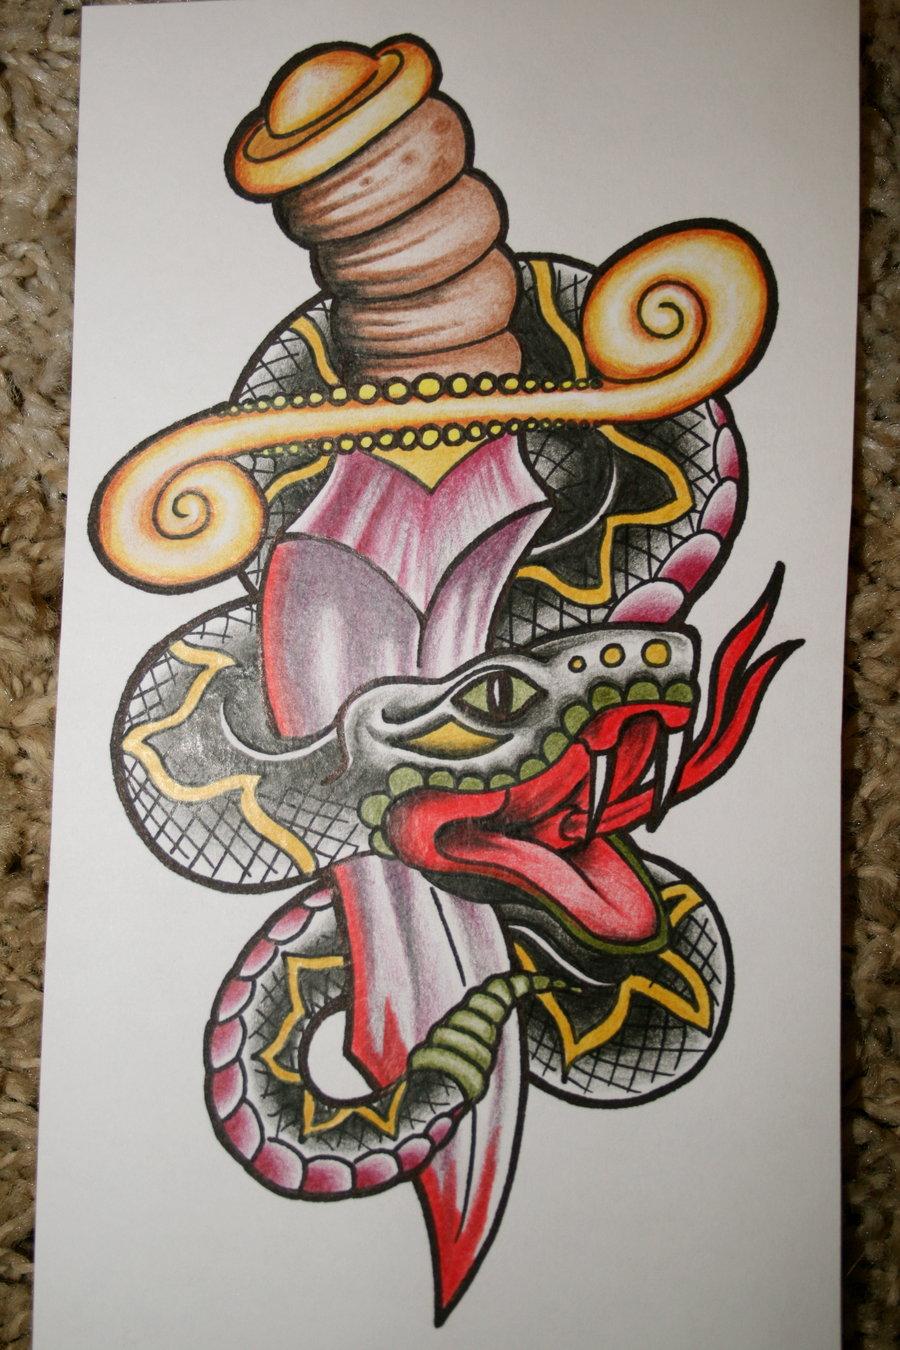 Knife Through Heart Tattoo Drawings